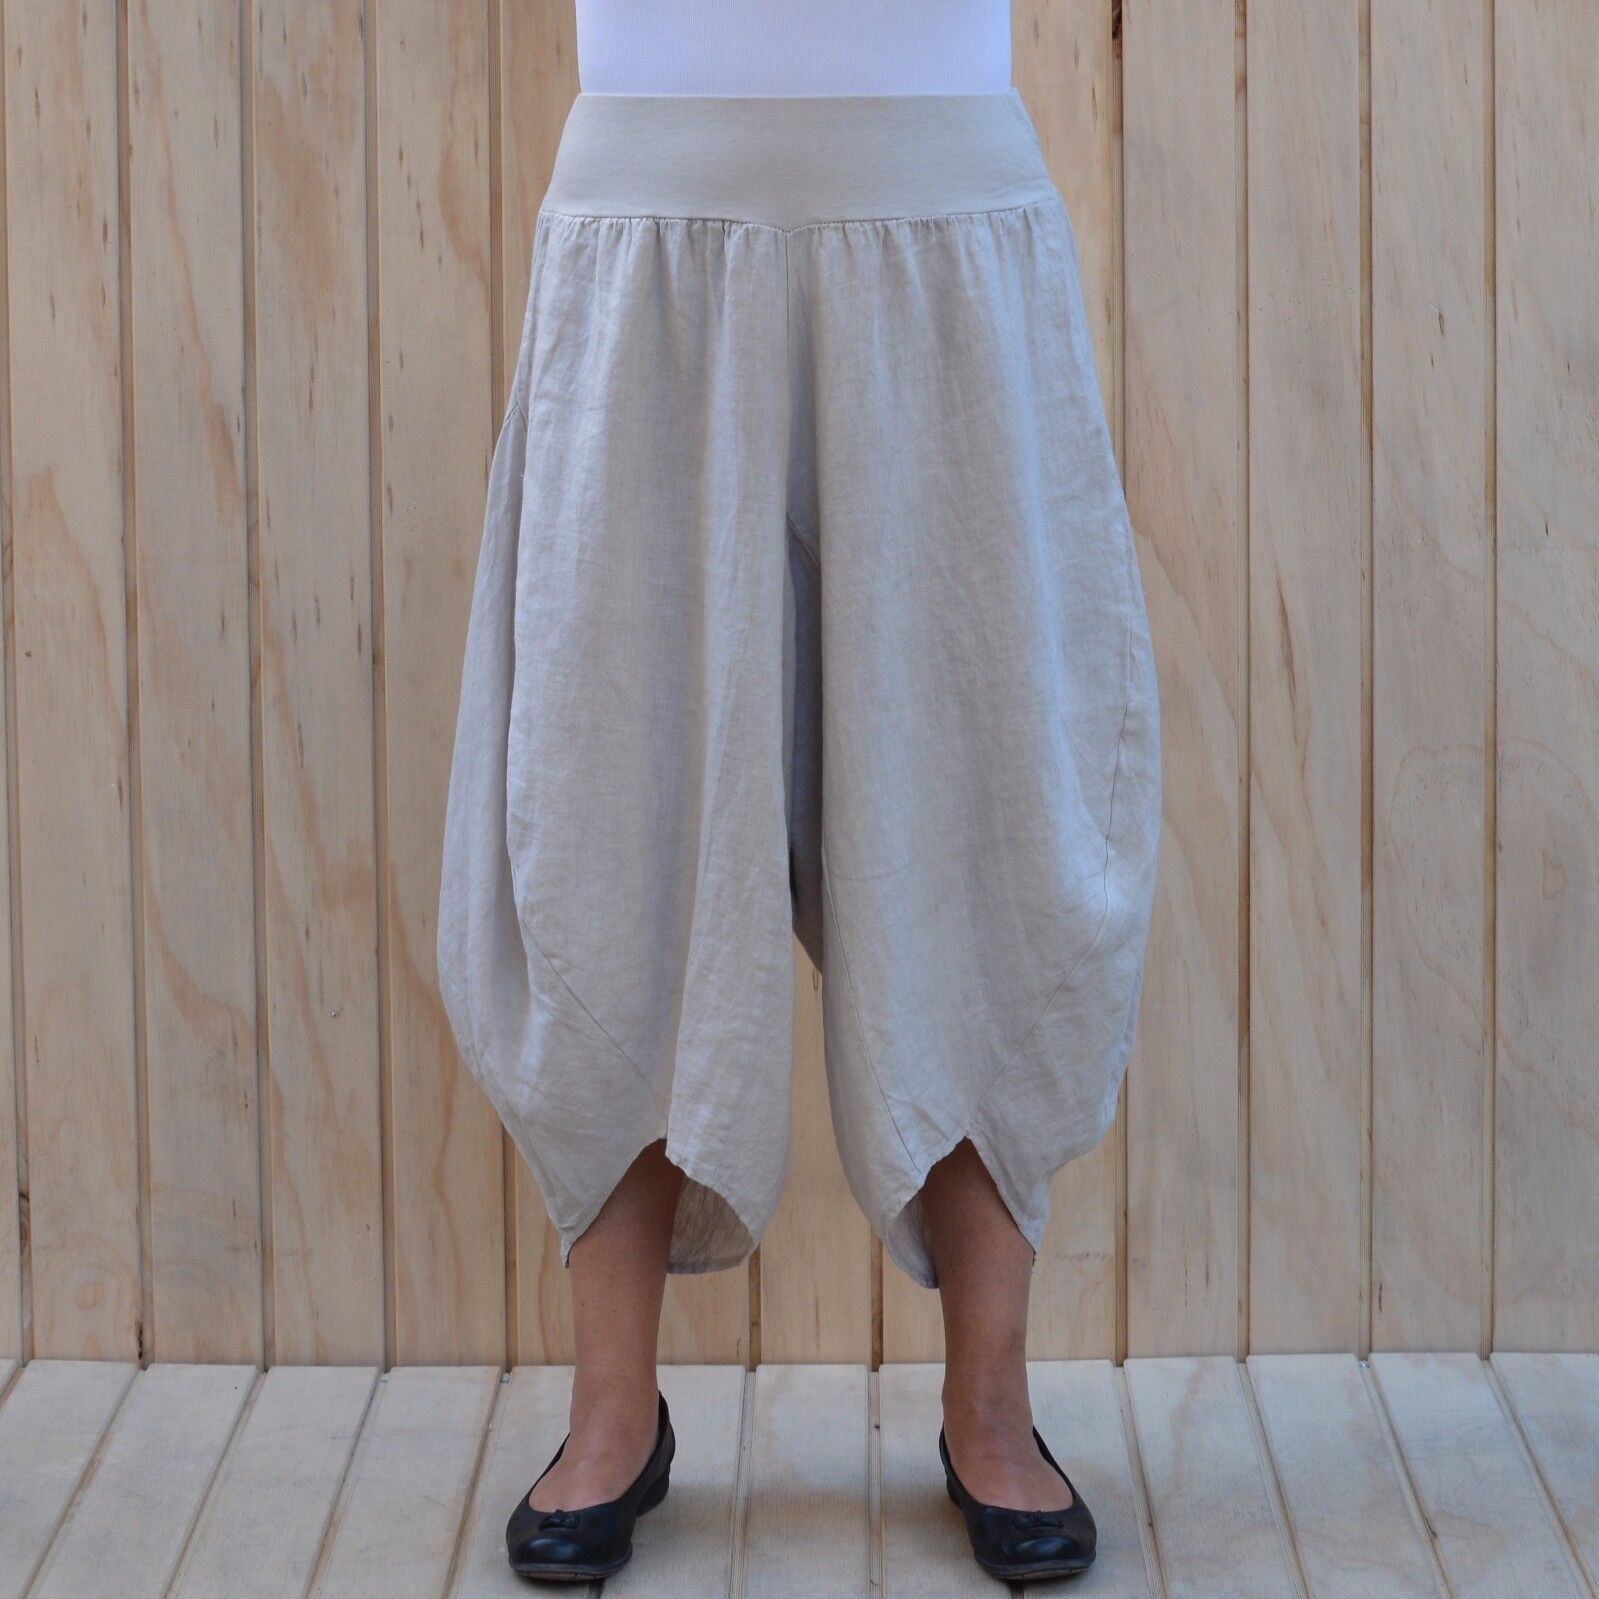 Ladies Lagenlook Tulip Harem Trousers Linen Size 16 18 20 22 24 26 28 30 32 9470